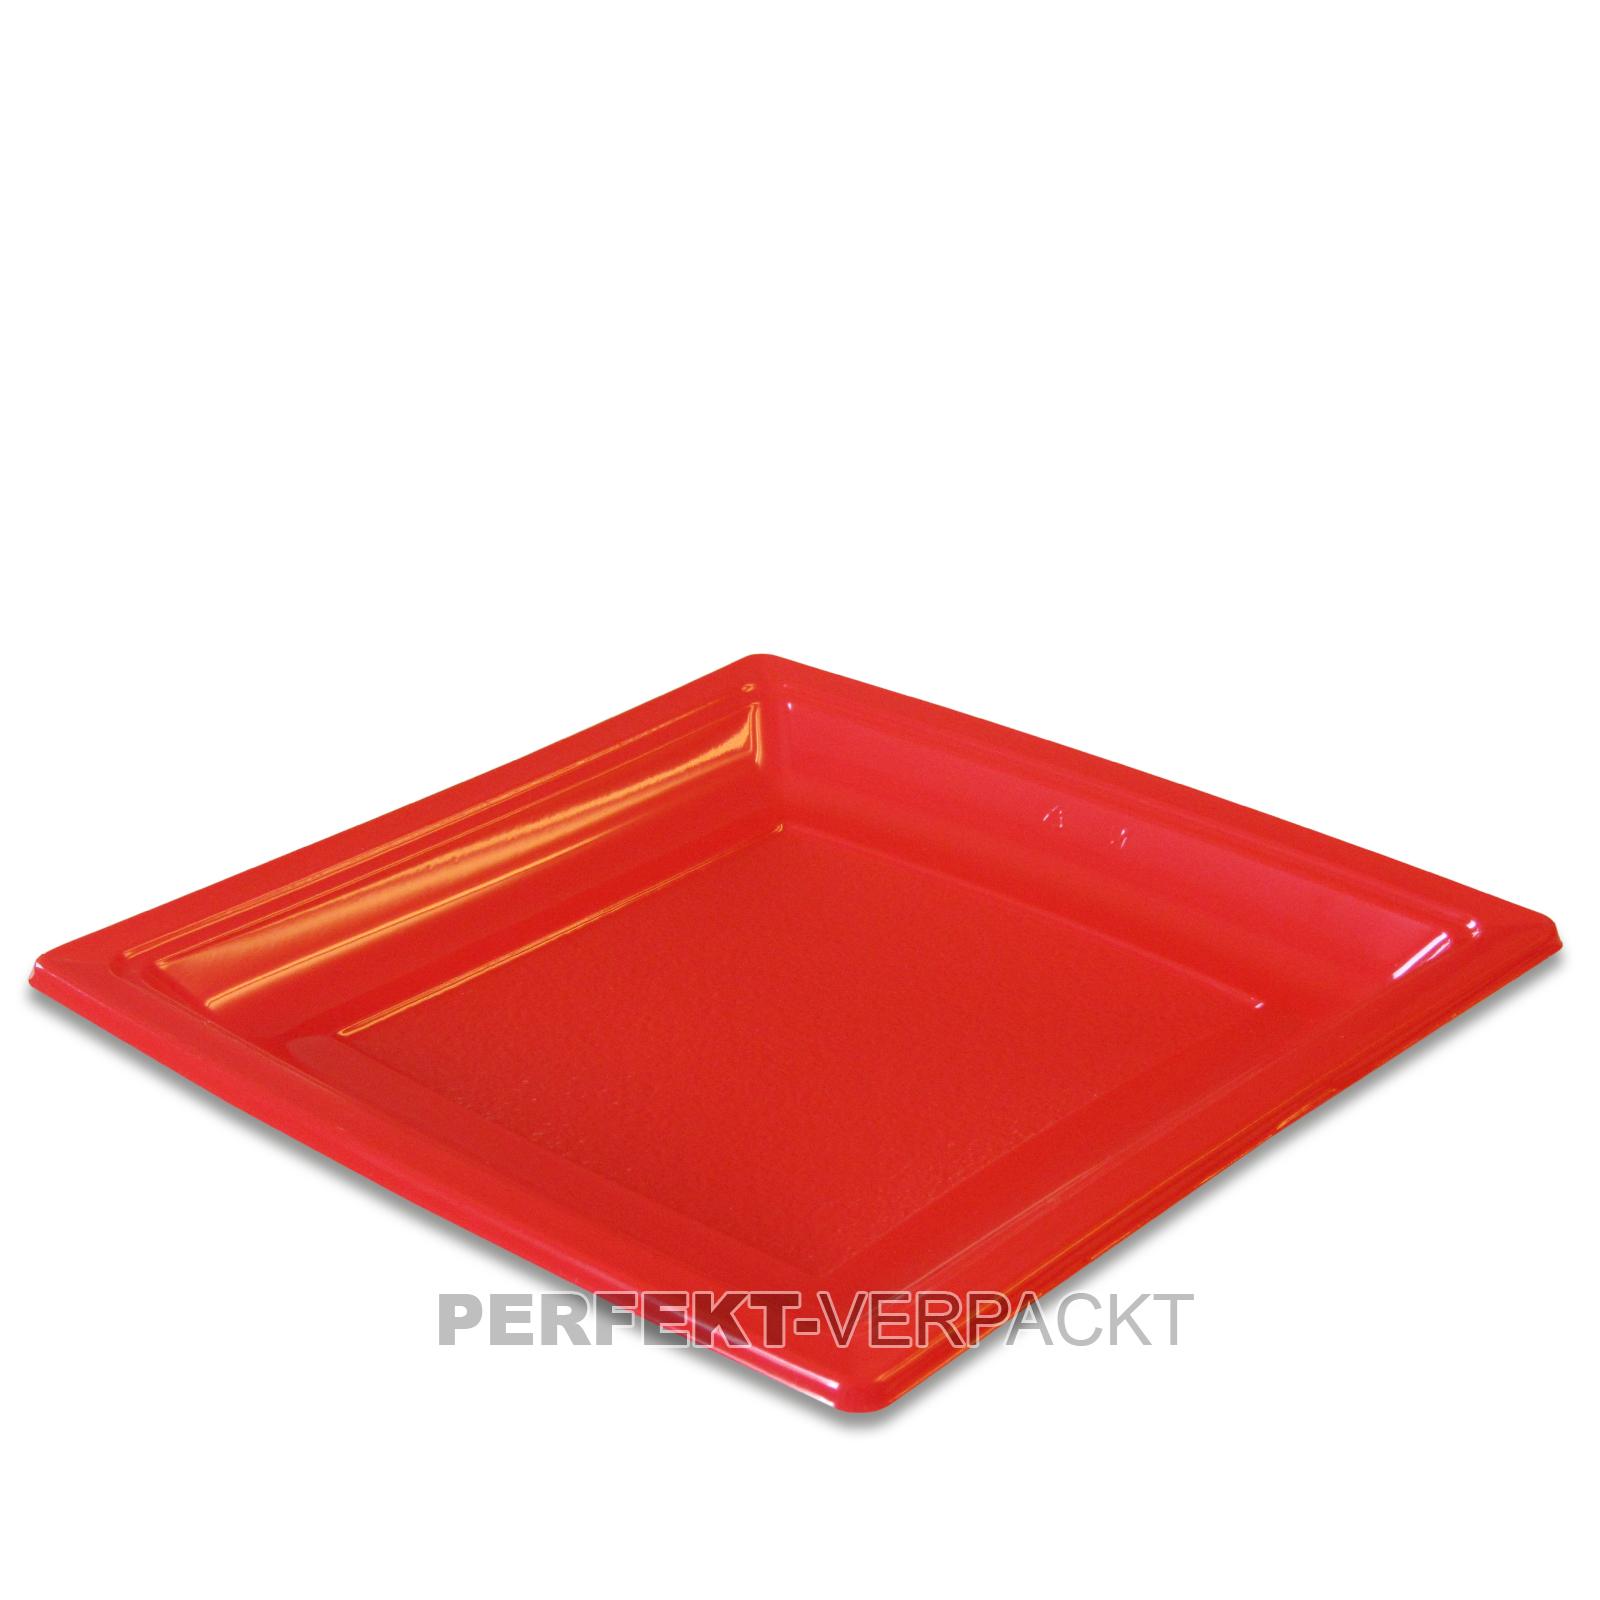 400 Teller quadratisch 18,4x18,4cm rot aus PS